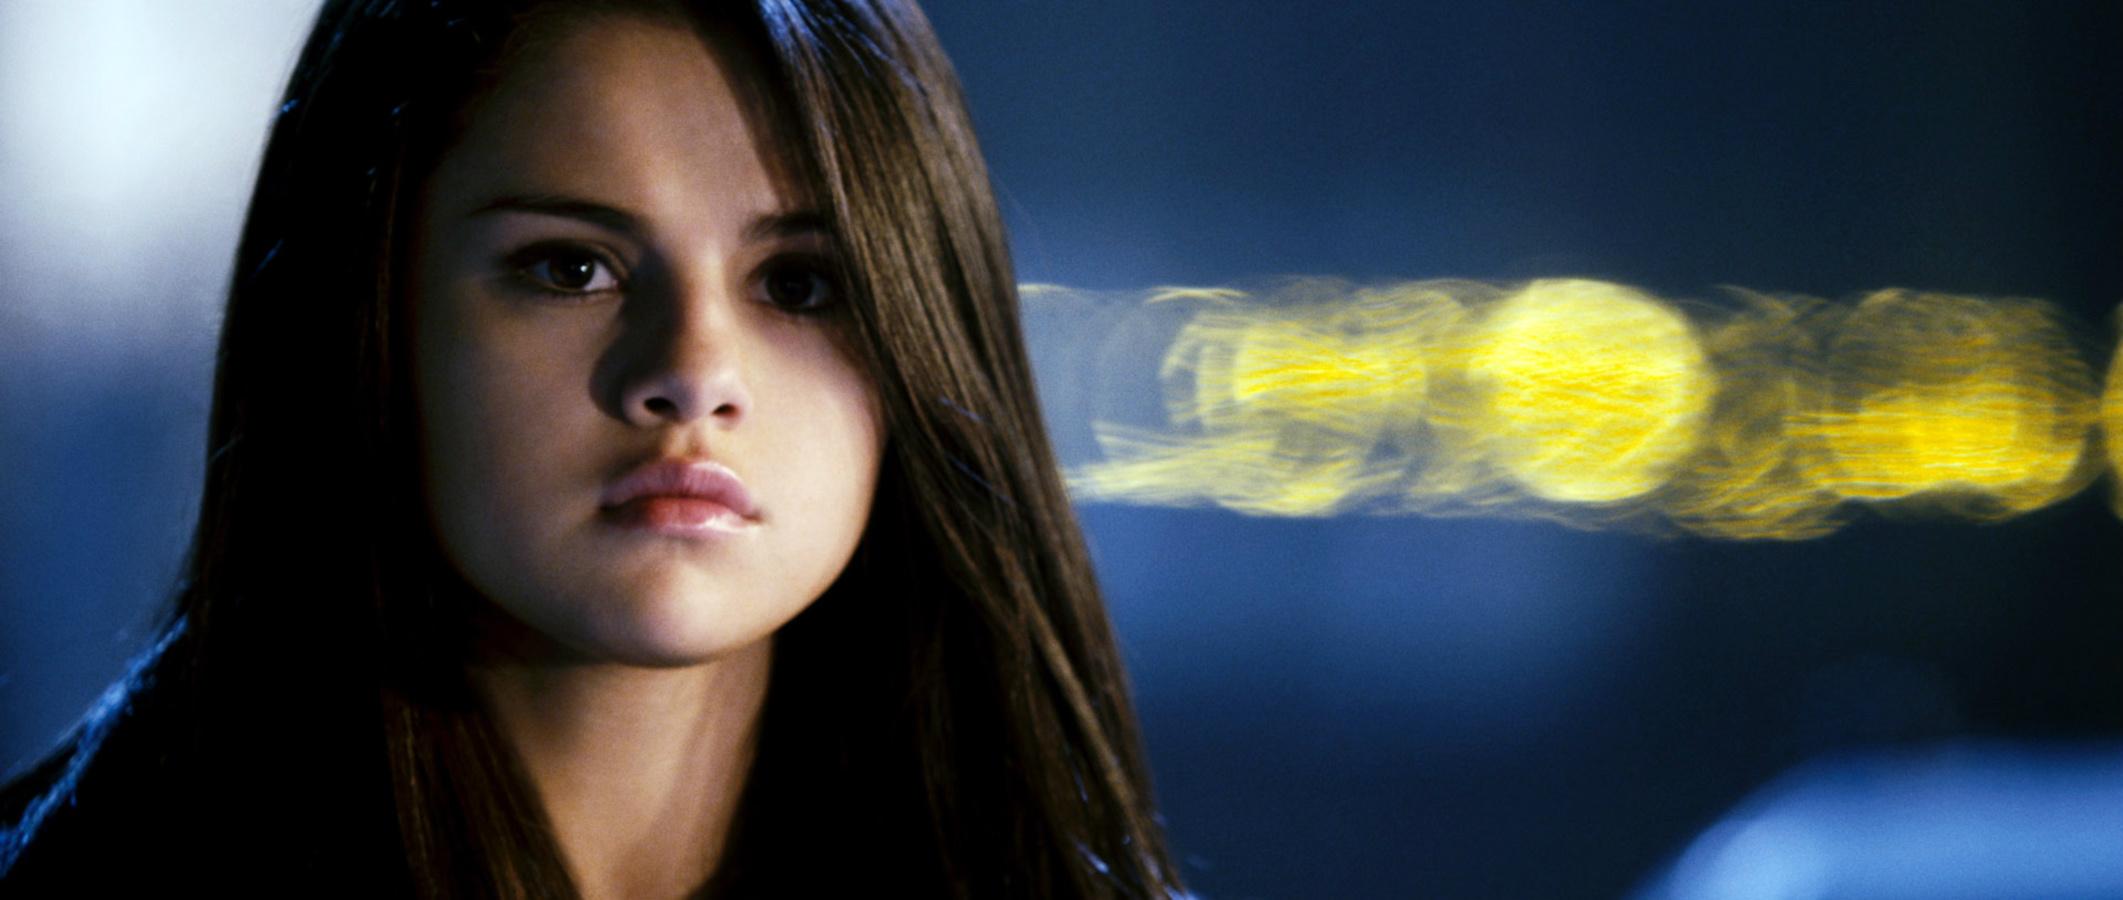 Resident Evil Final Chapter To Be Filmed On Gold Coast: Movie News: Selena Gomez Joins Robert Downey, Jr.'s